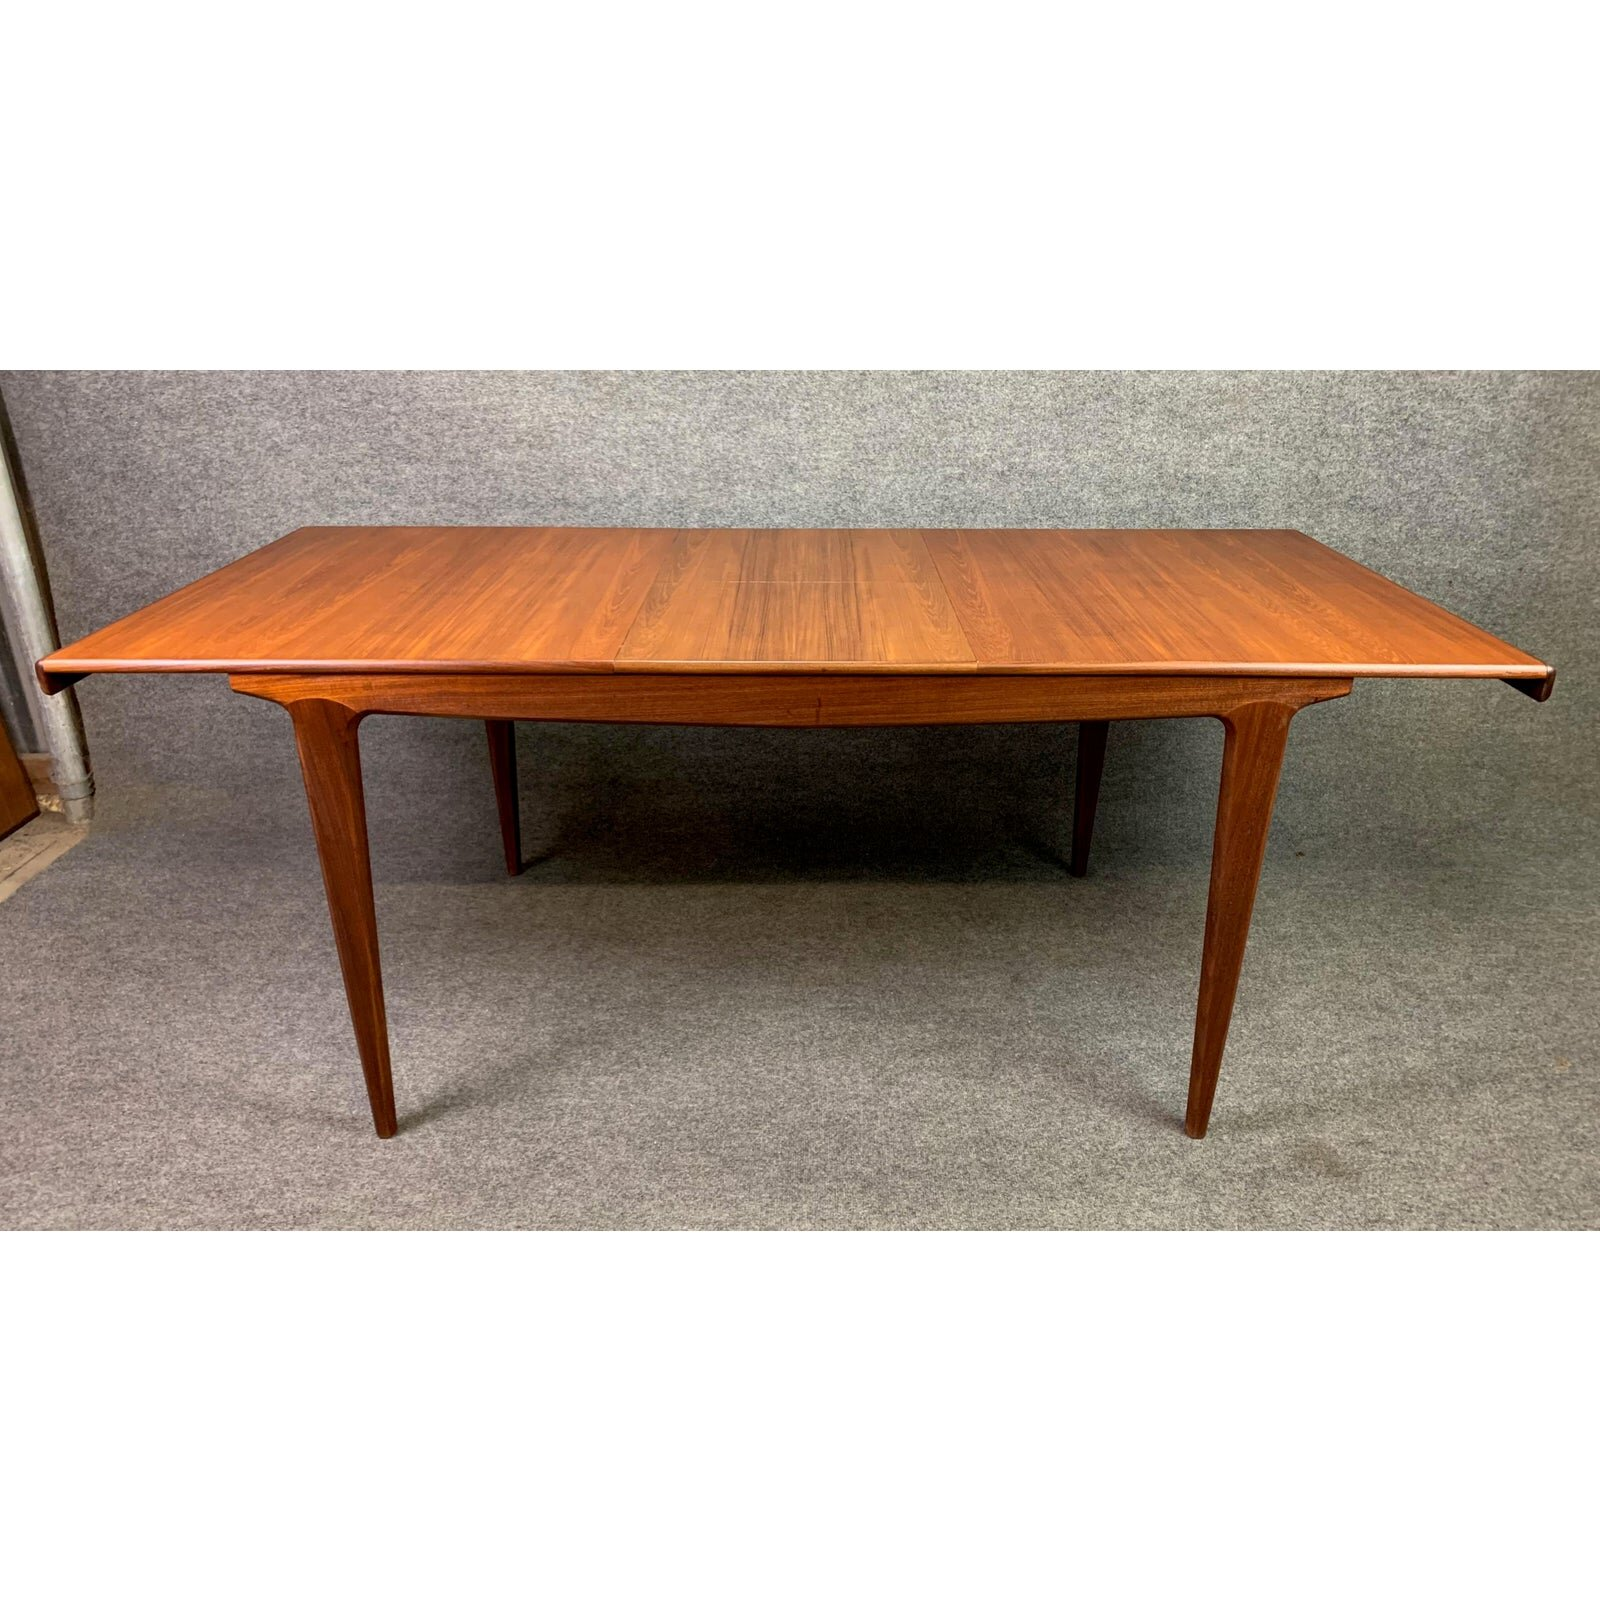 Vintage British Mid Century Modern Teak Dining Table By John Herbert For A Younger Ltd Aymerick Modern